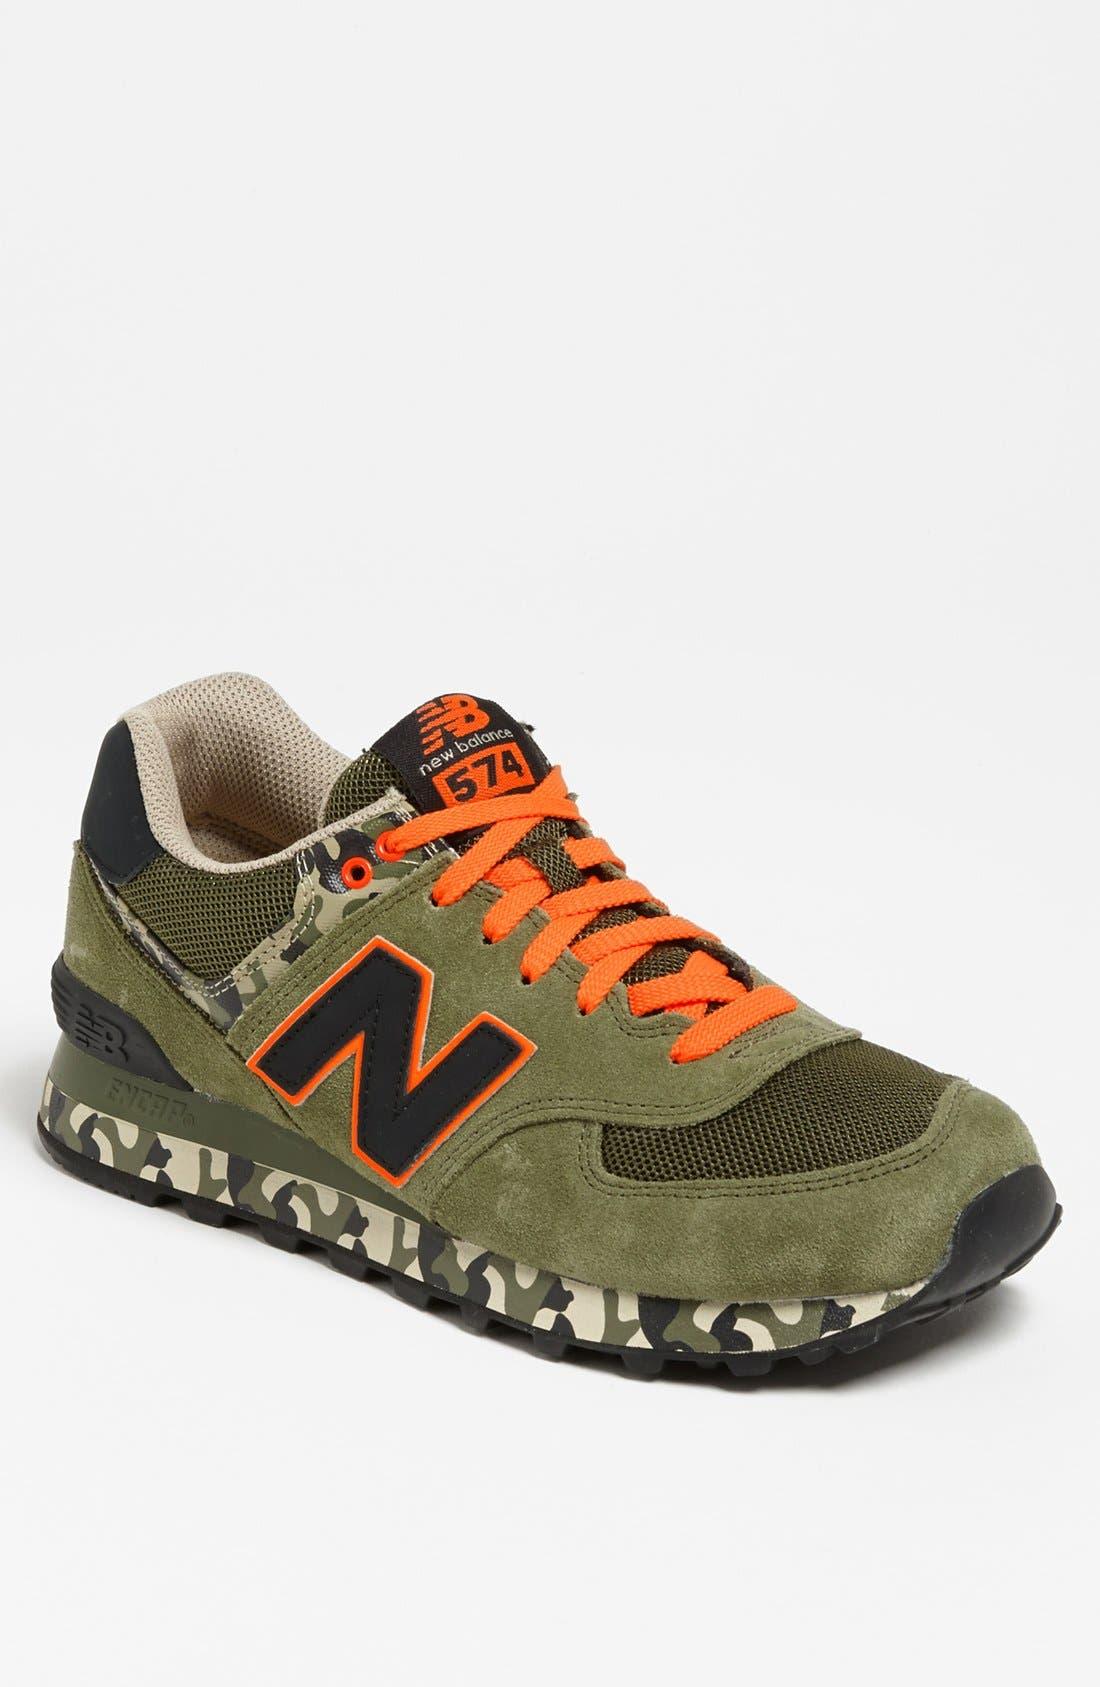 Alternate Image 1 Selected - New Balance '574 Camo' Sneaker (Men)